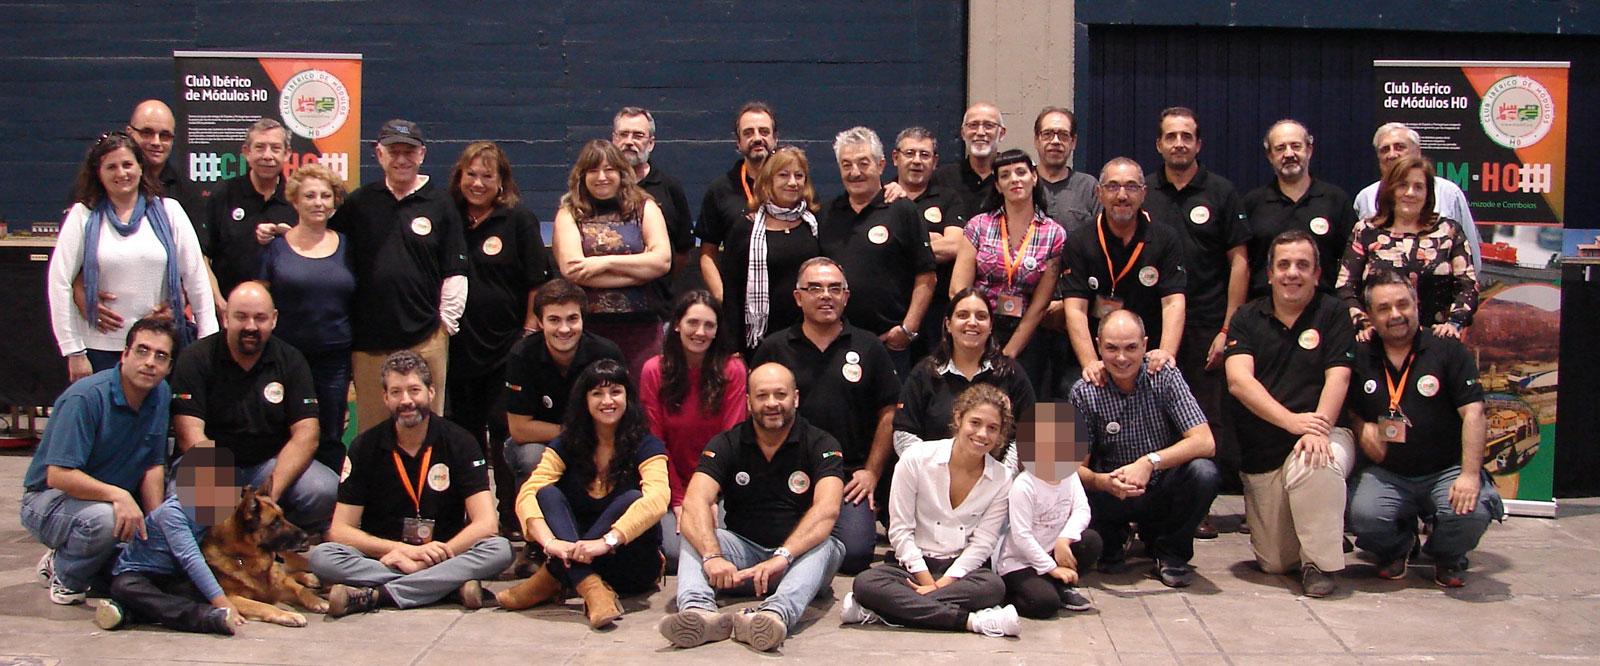 Grupo Mérida 2016 - cimH0